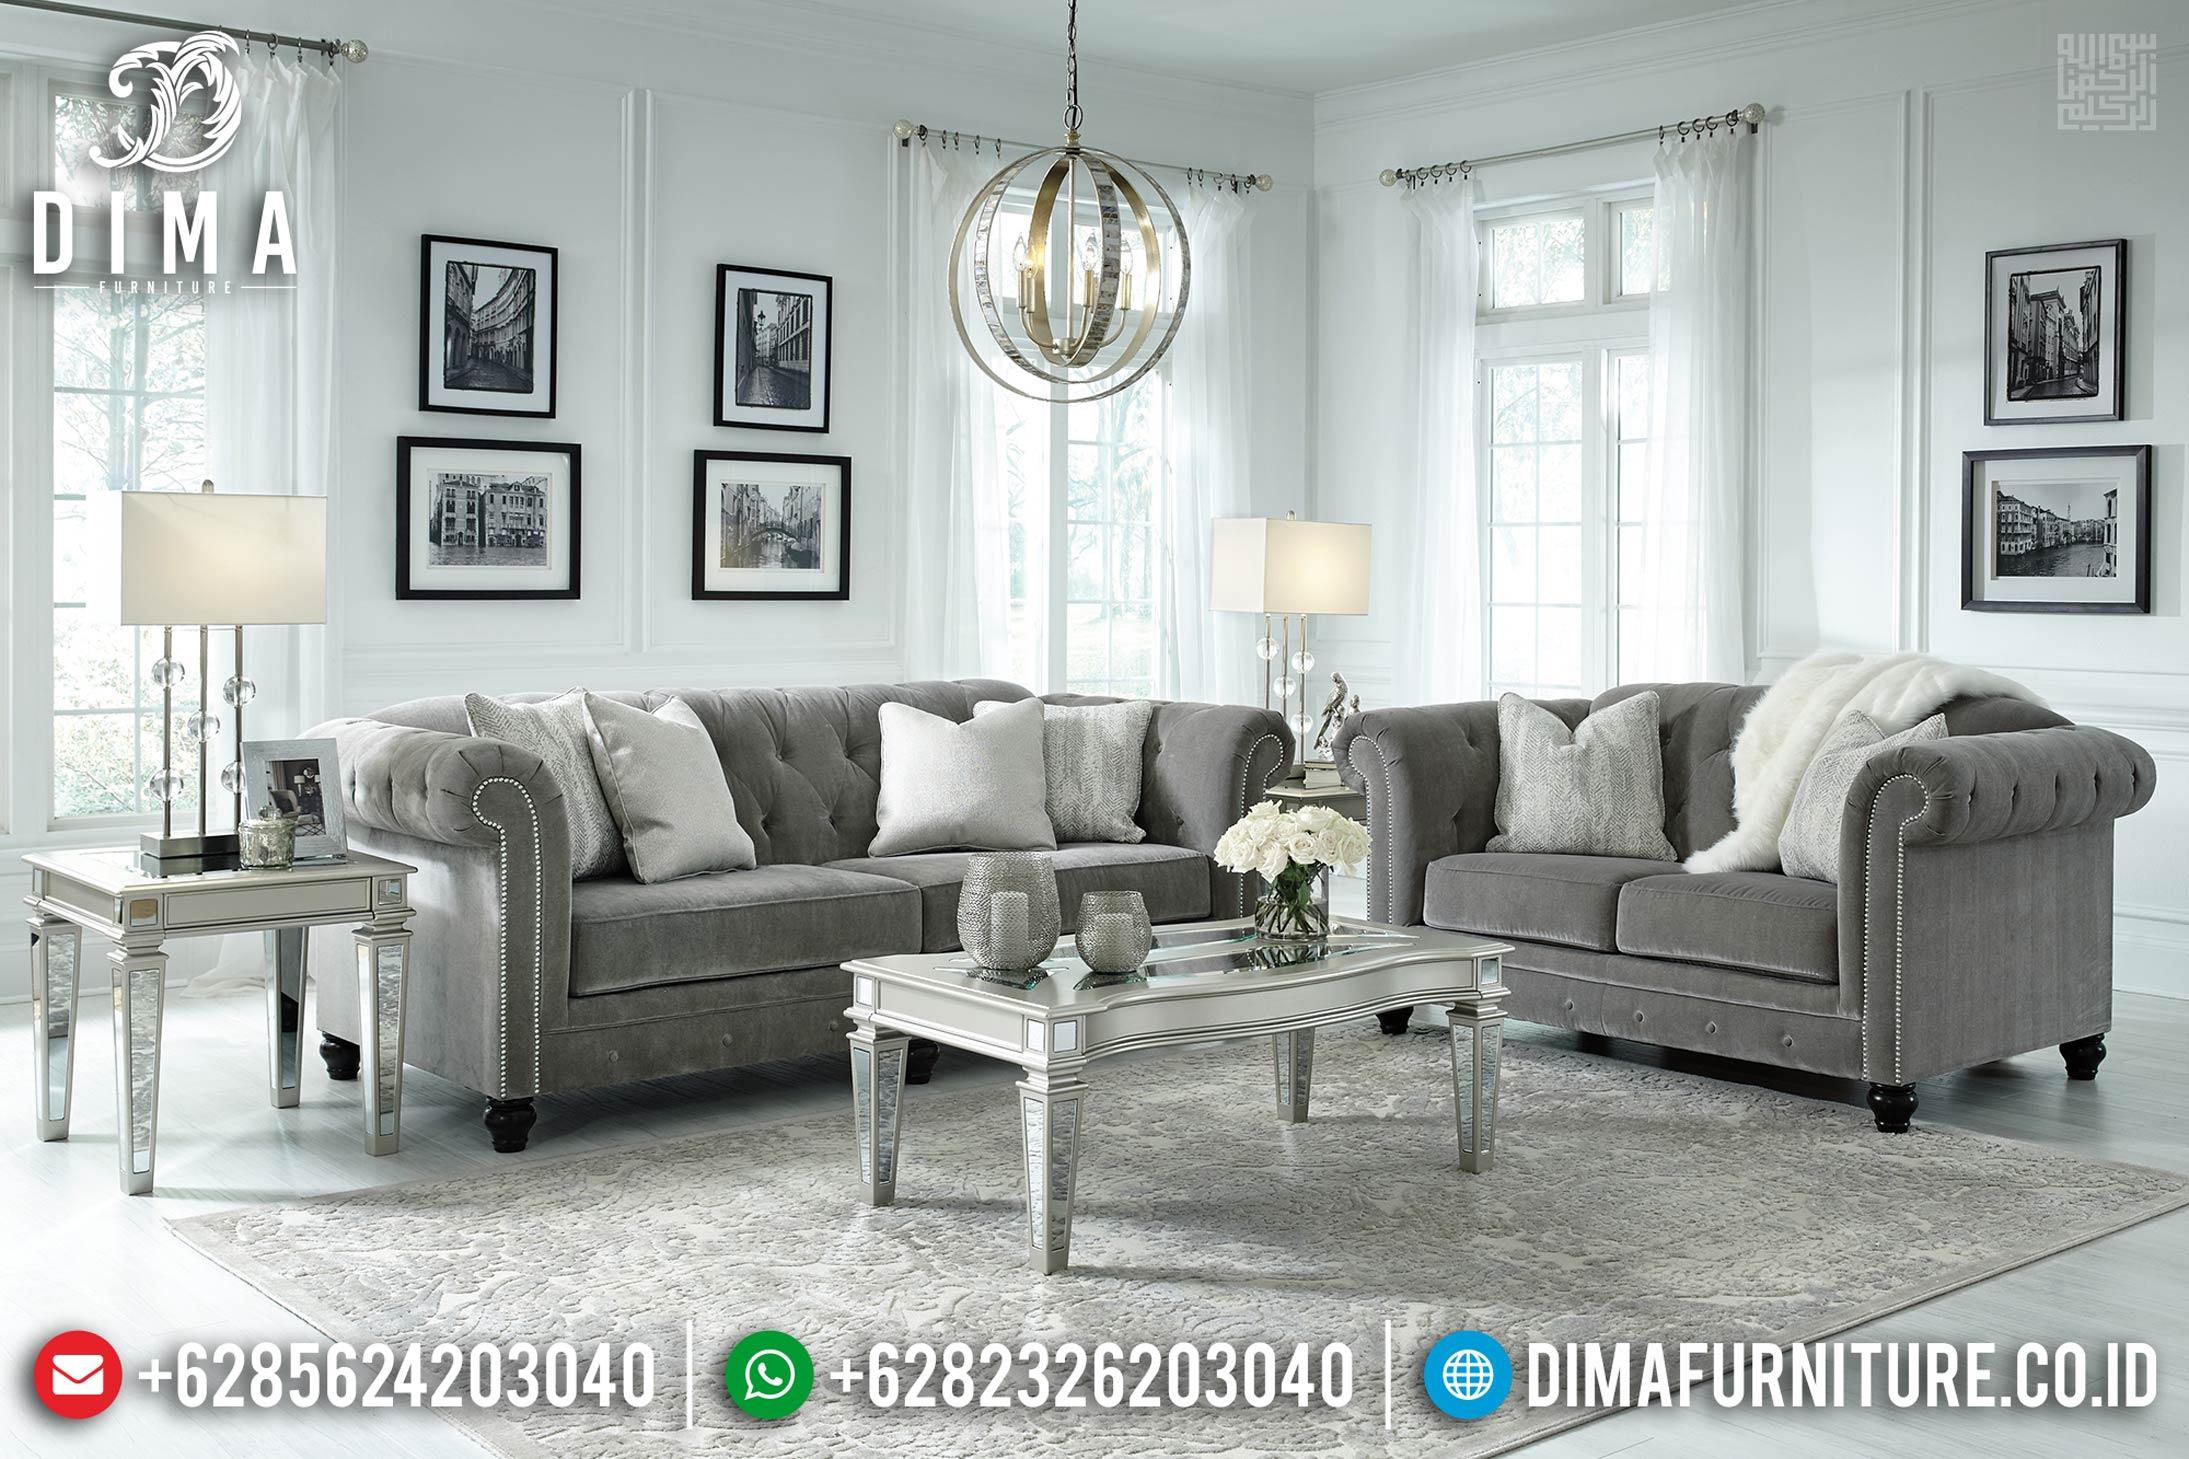 New Sofa Tamu Chesterfield Modern Glass Combined TTJ-0370